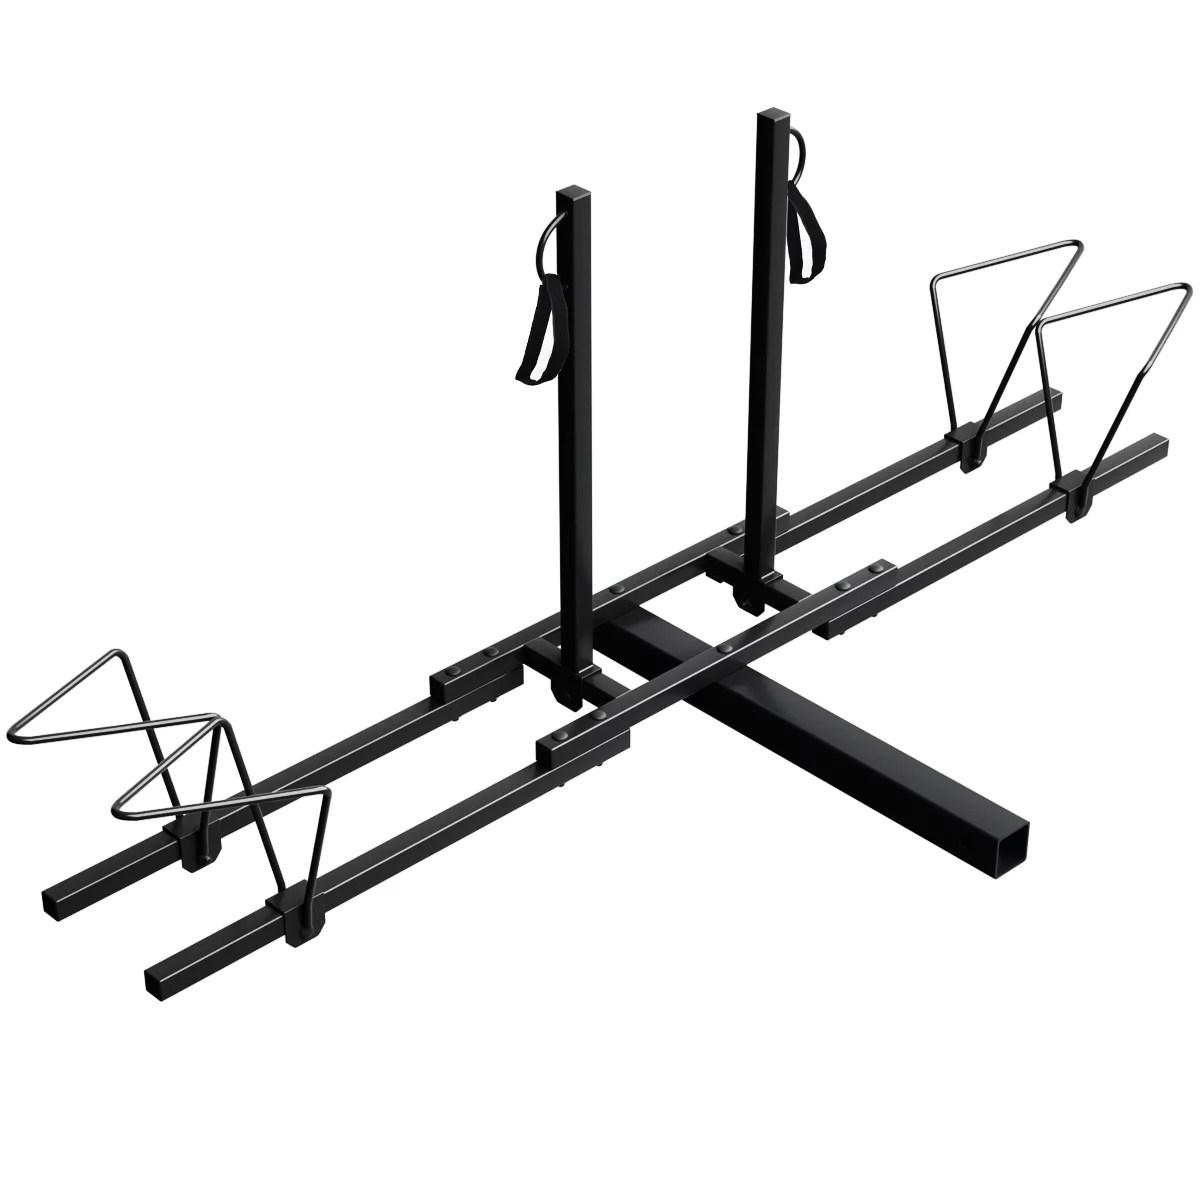 costway upright heavy duty 2 bike bicycle hitch mount carrier platform rack truck suv